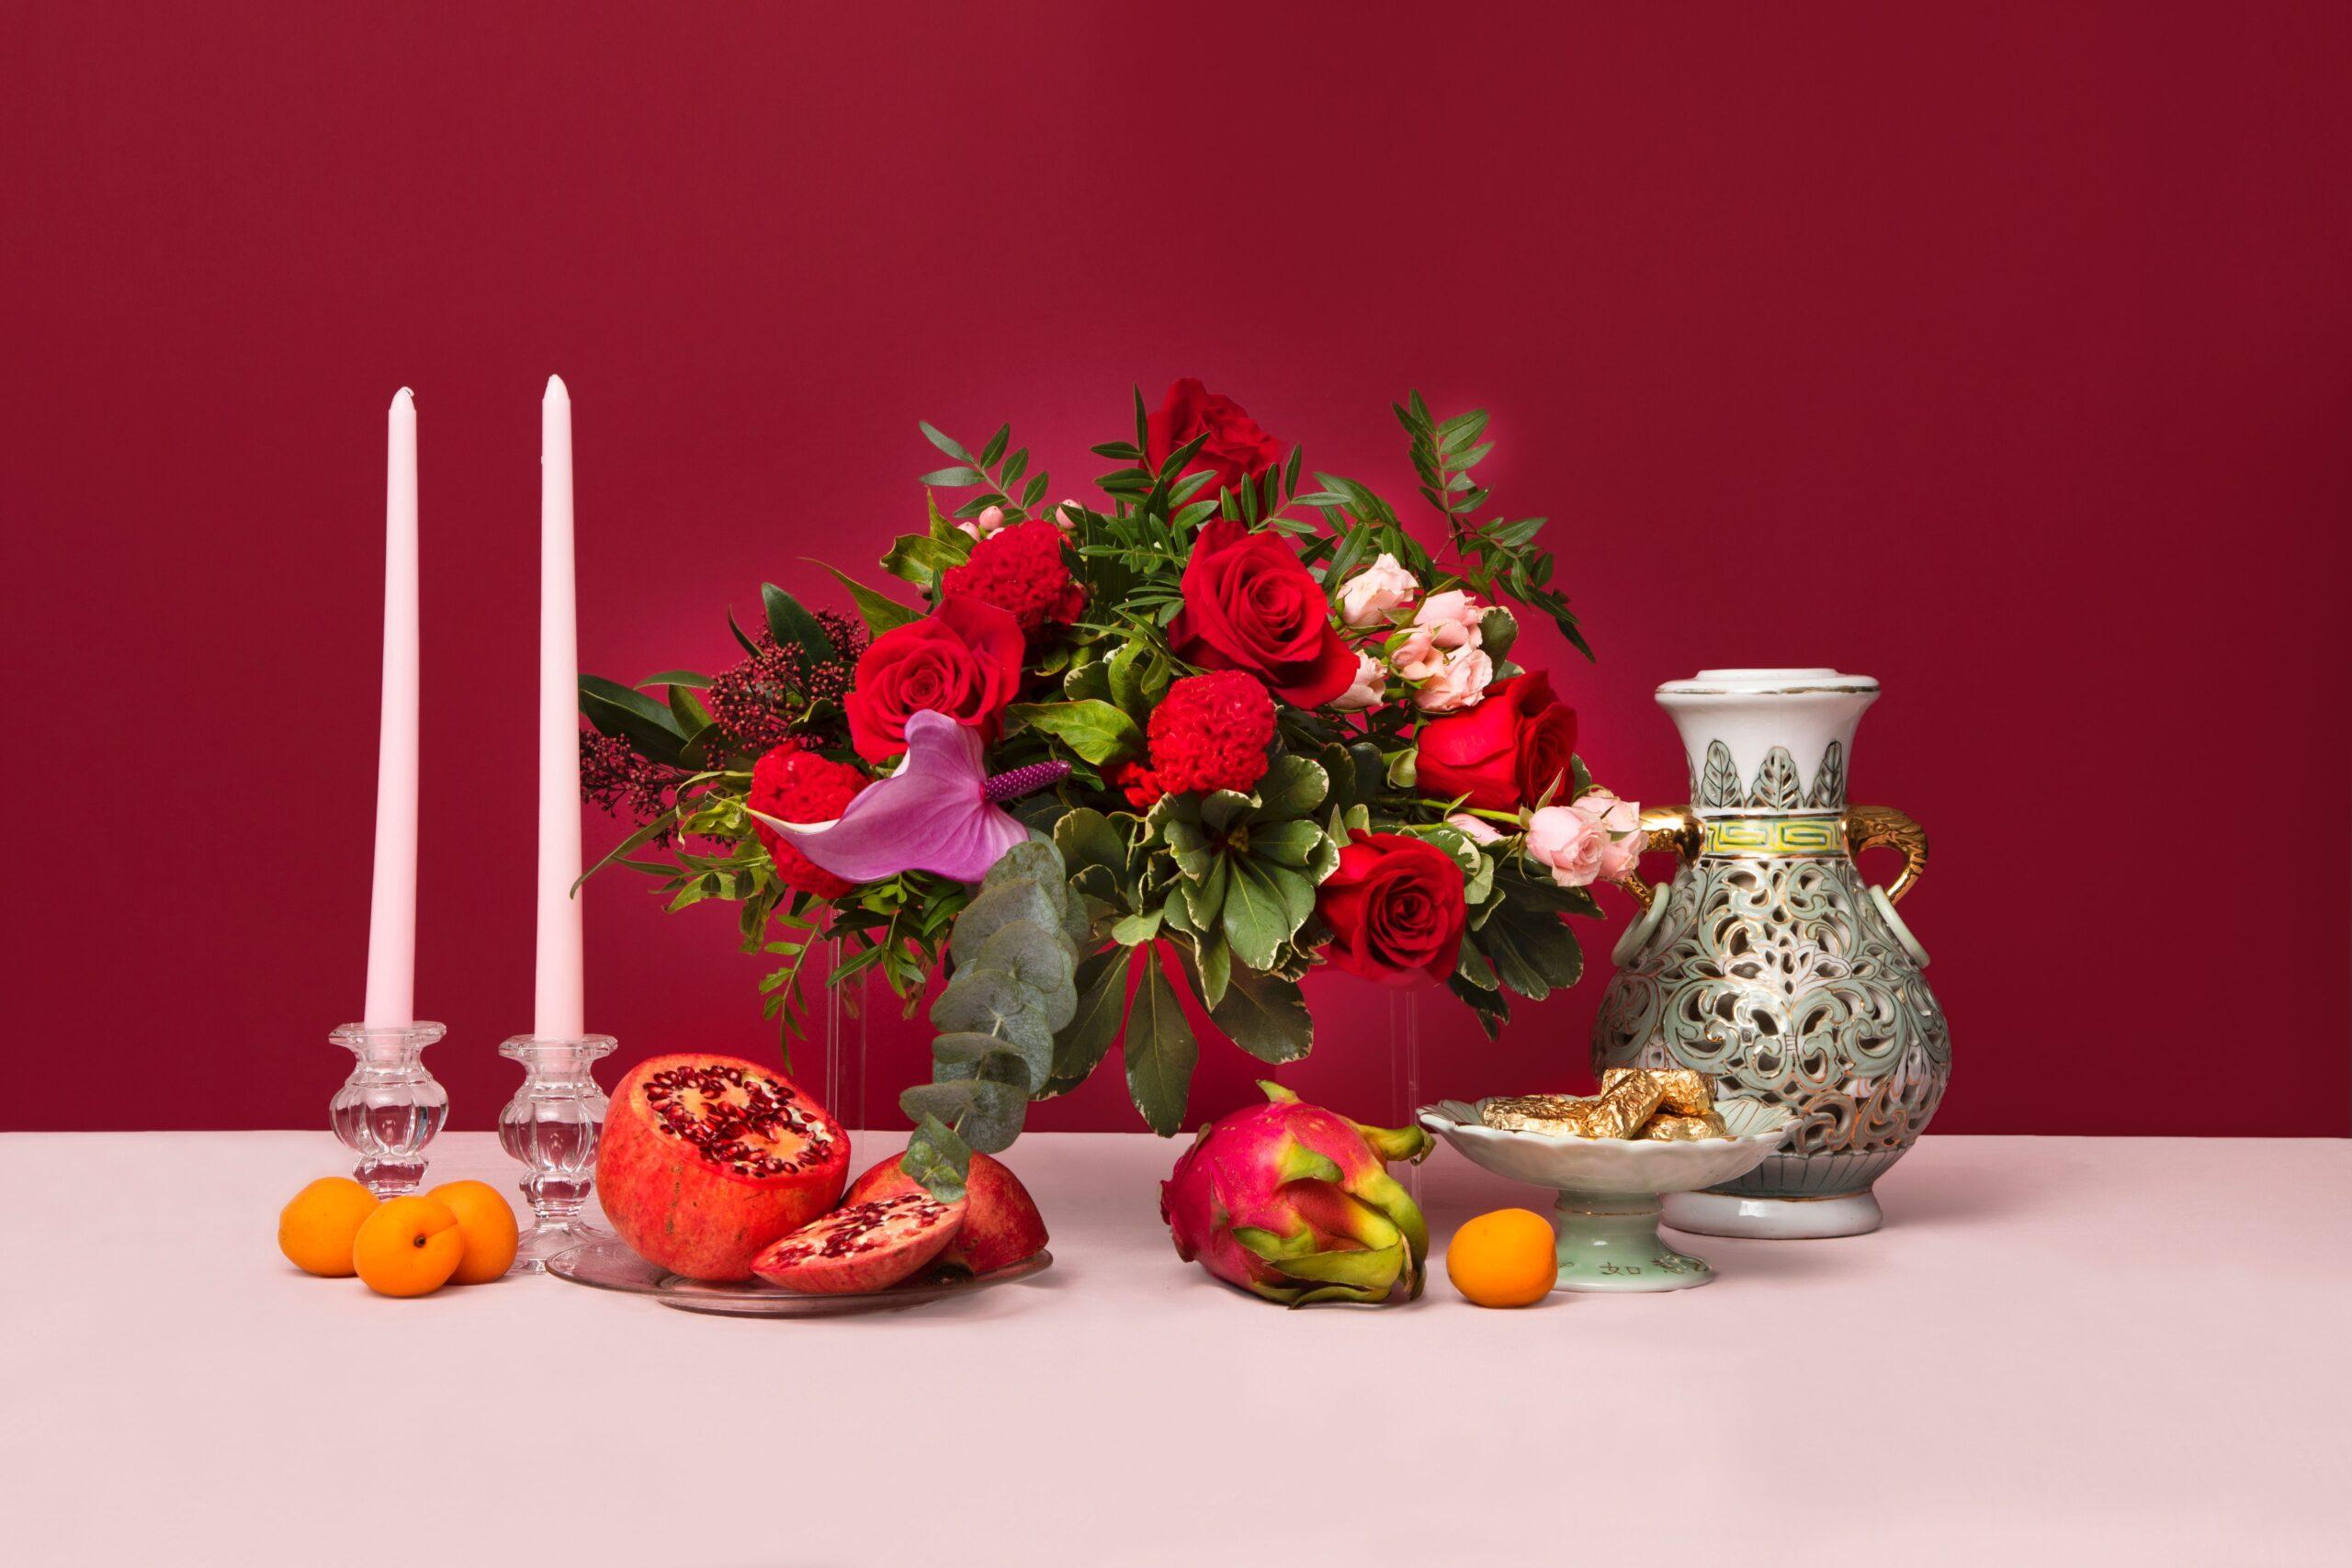 bydeau valentine's flowers